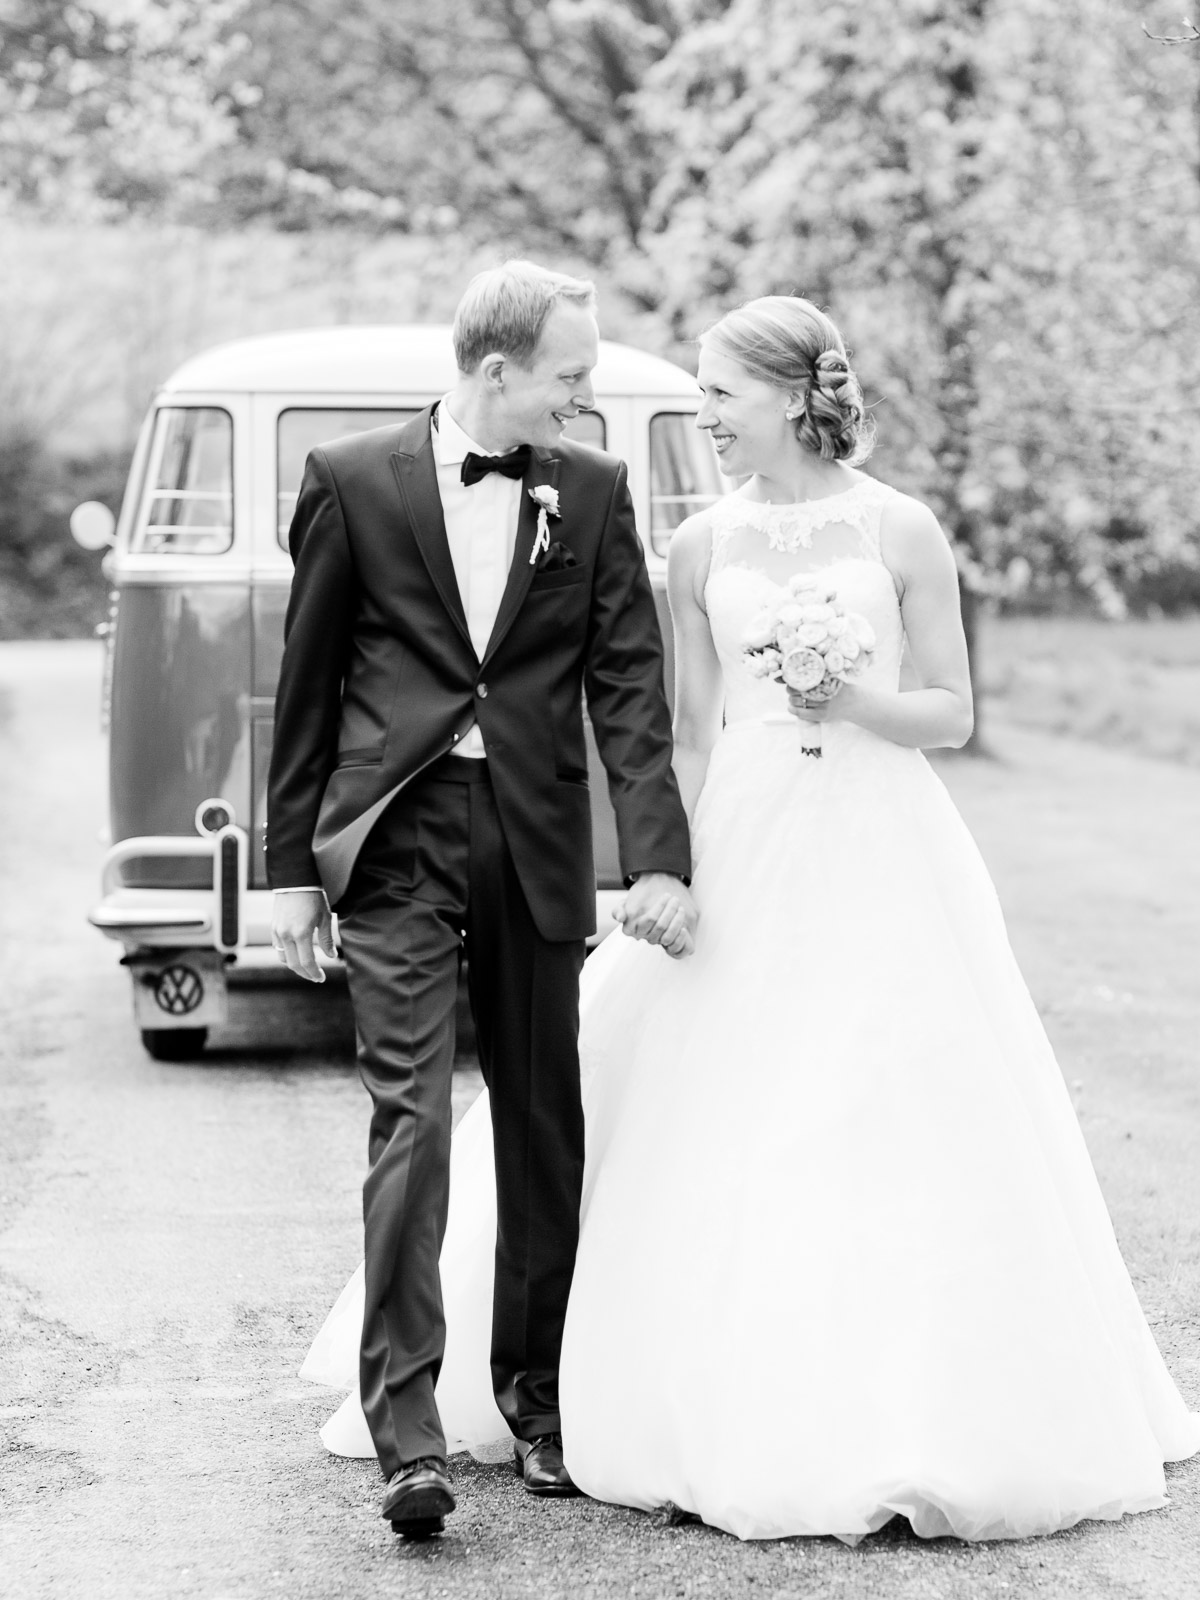 Hochzeitsfotograf-Bielefeld-2016-04-23027